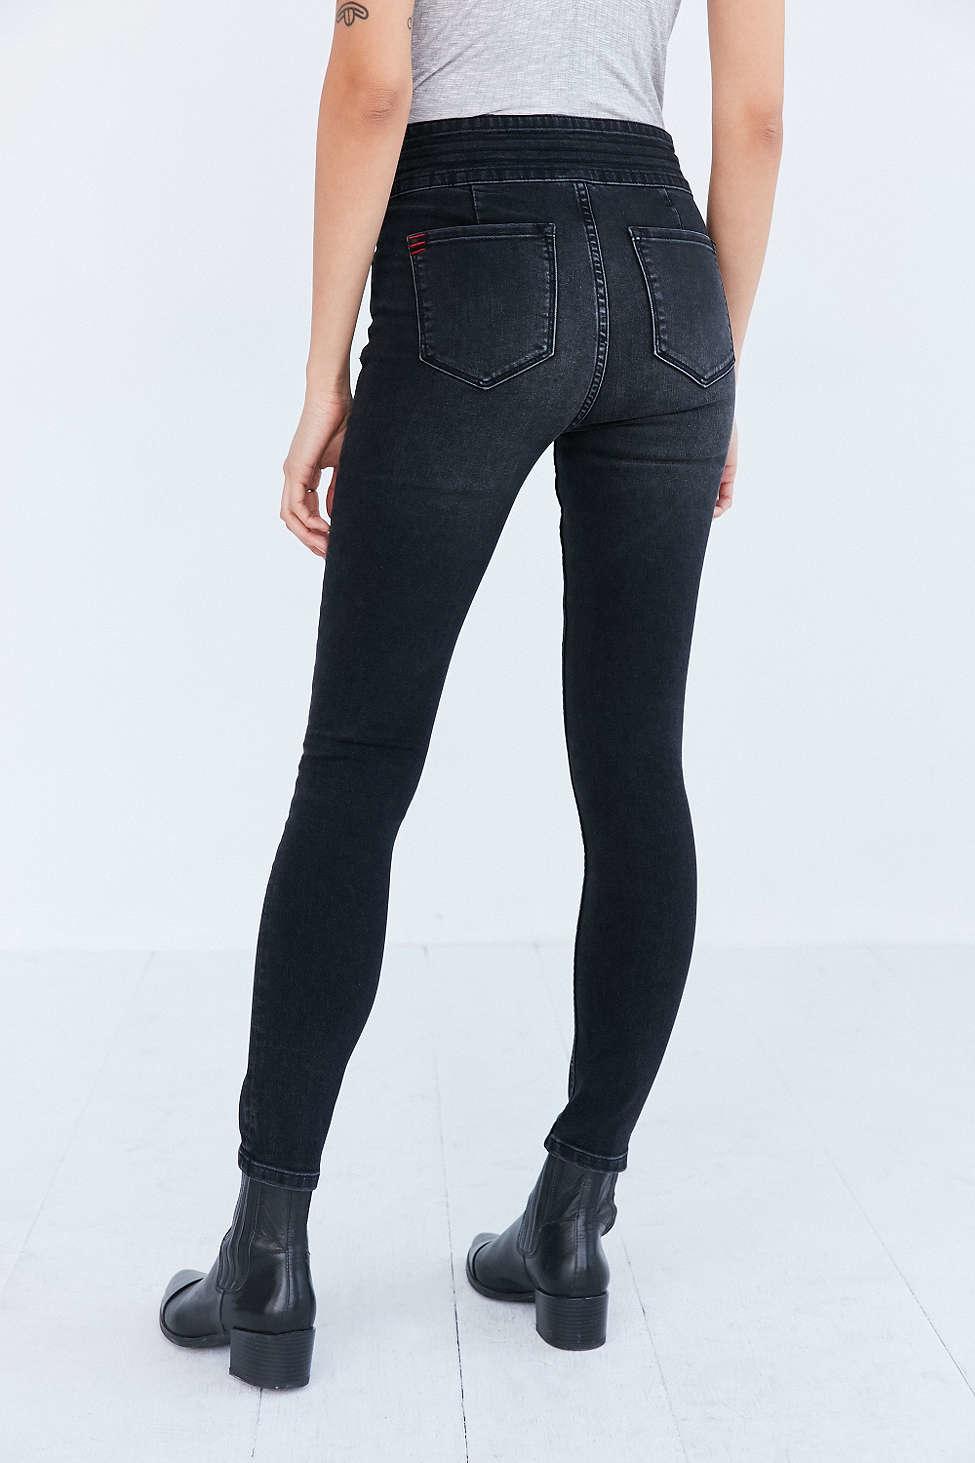 High Rise Skinny Jeans in Black. Sale $ Orig $